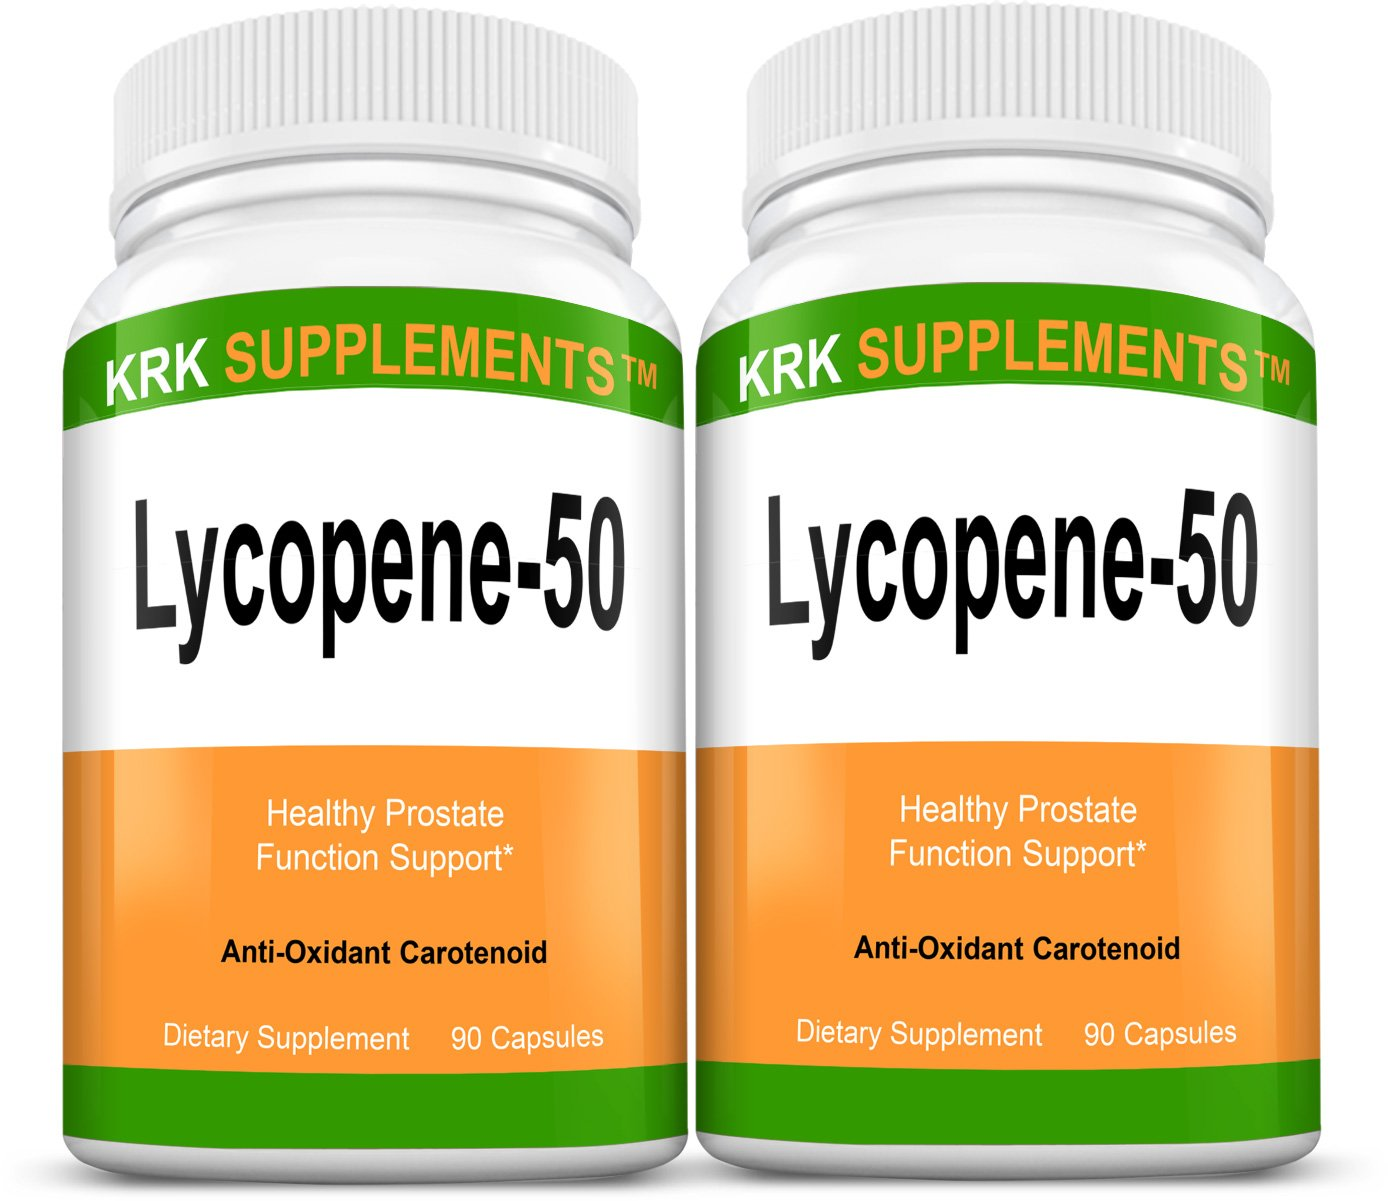 2 Bottles Lycopene 50mg 180 Total Capsules KRK Supplements by KRK SUPPLEMENTS